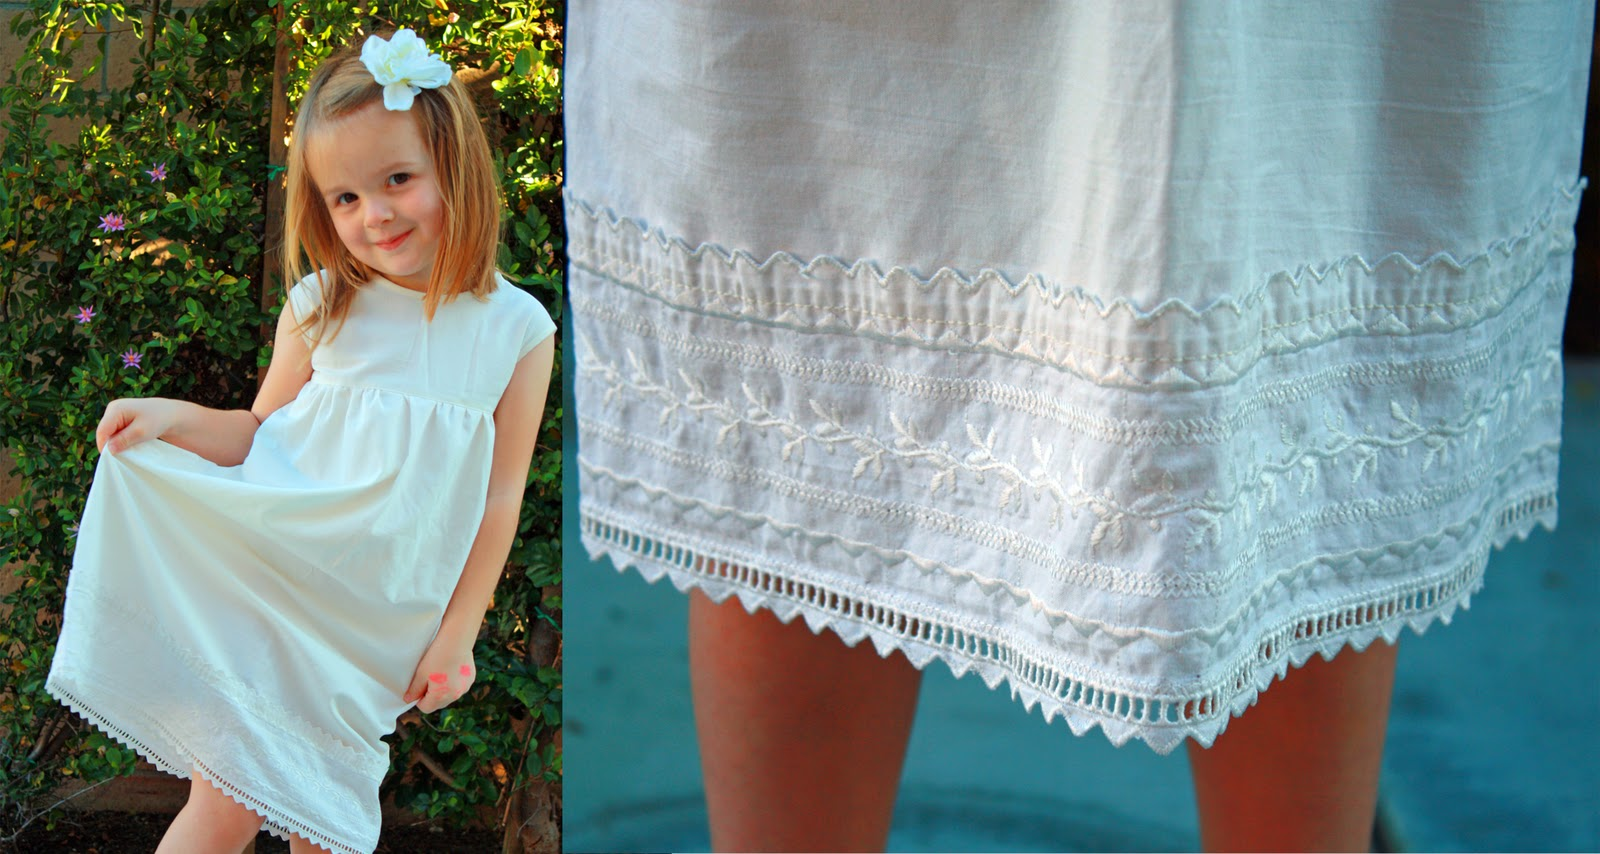 Diy Pillowcase Nightie: DIY Pillowcase Nightgowns   iCandy handmade,